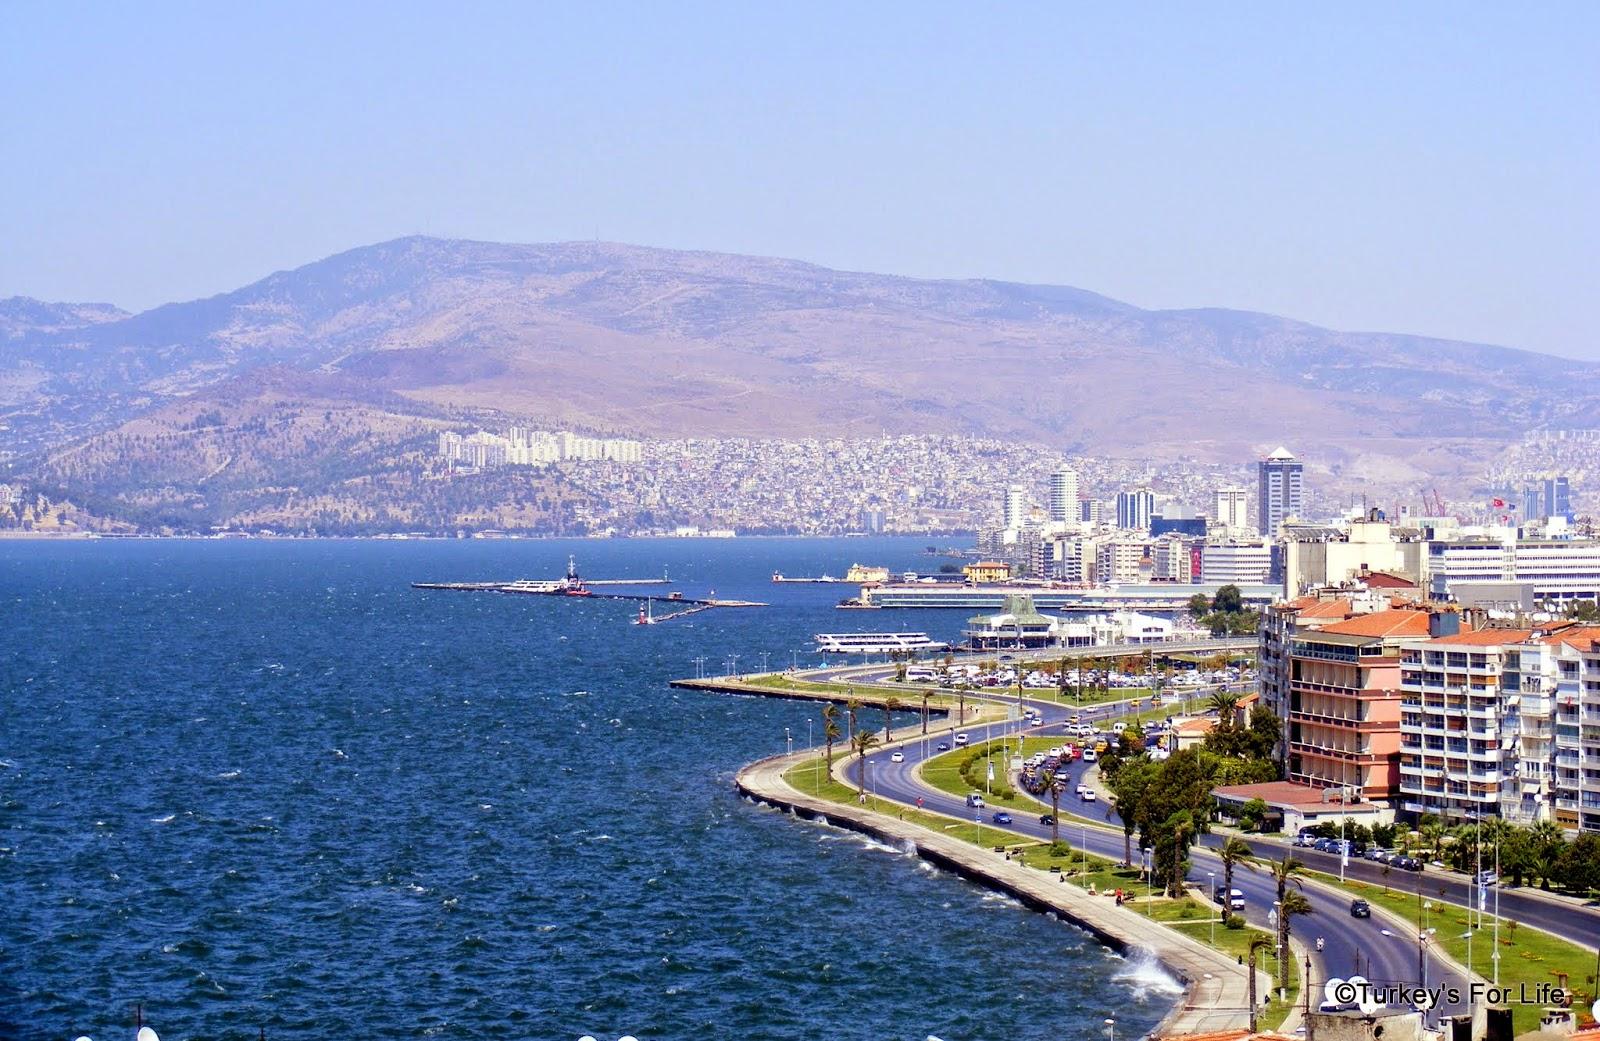 Lowongan Spa Therapist Wanita Hotel Turkey - Izmir